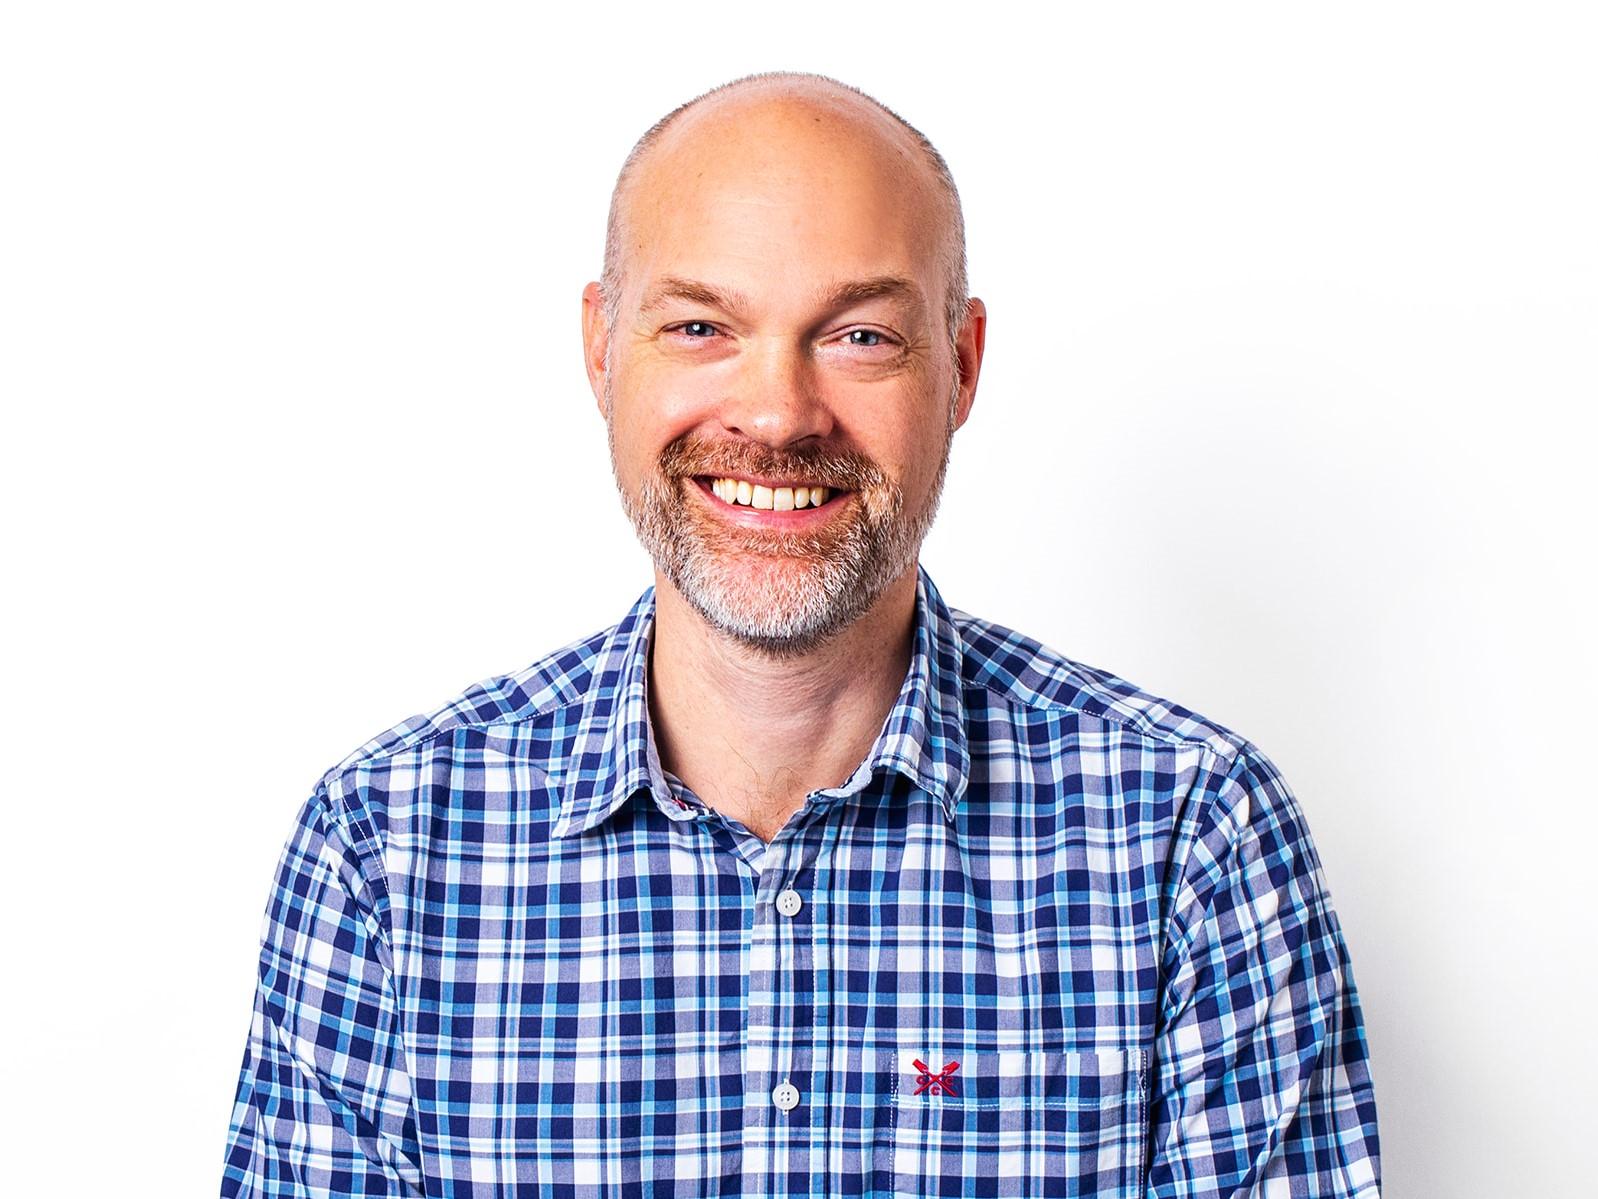 Craig Trumpess Senior Project Manager